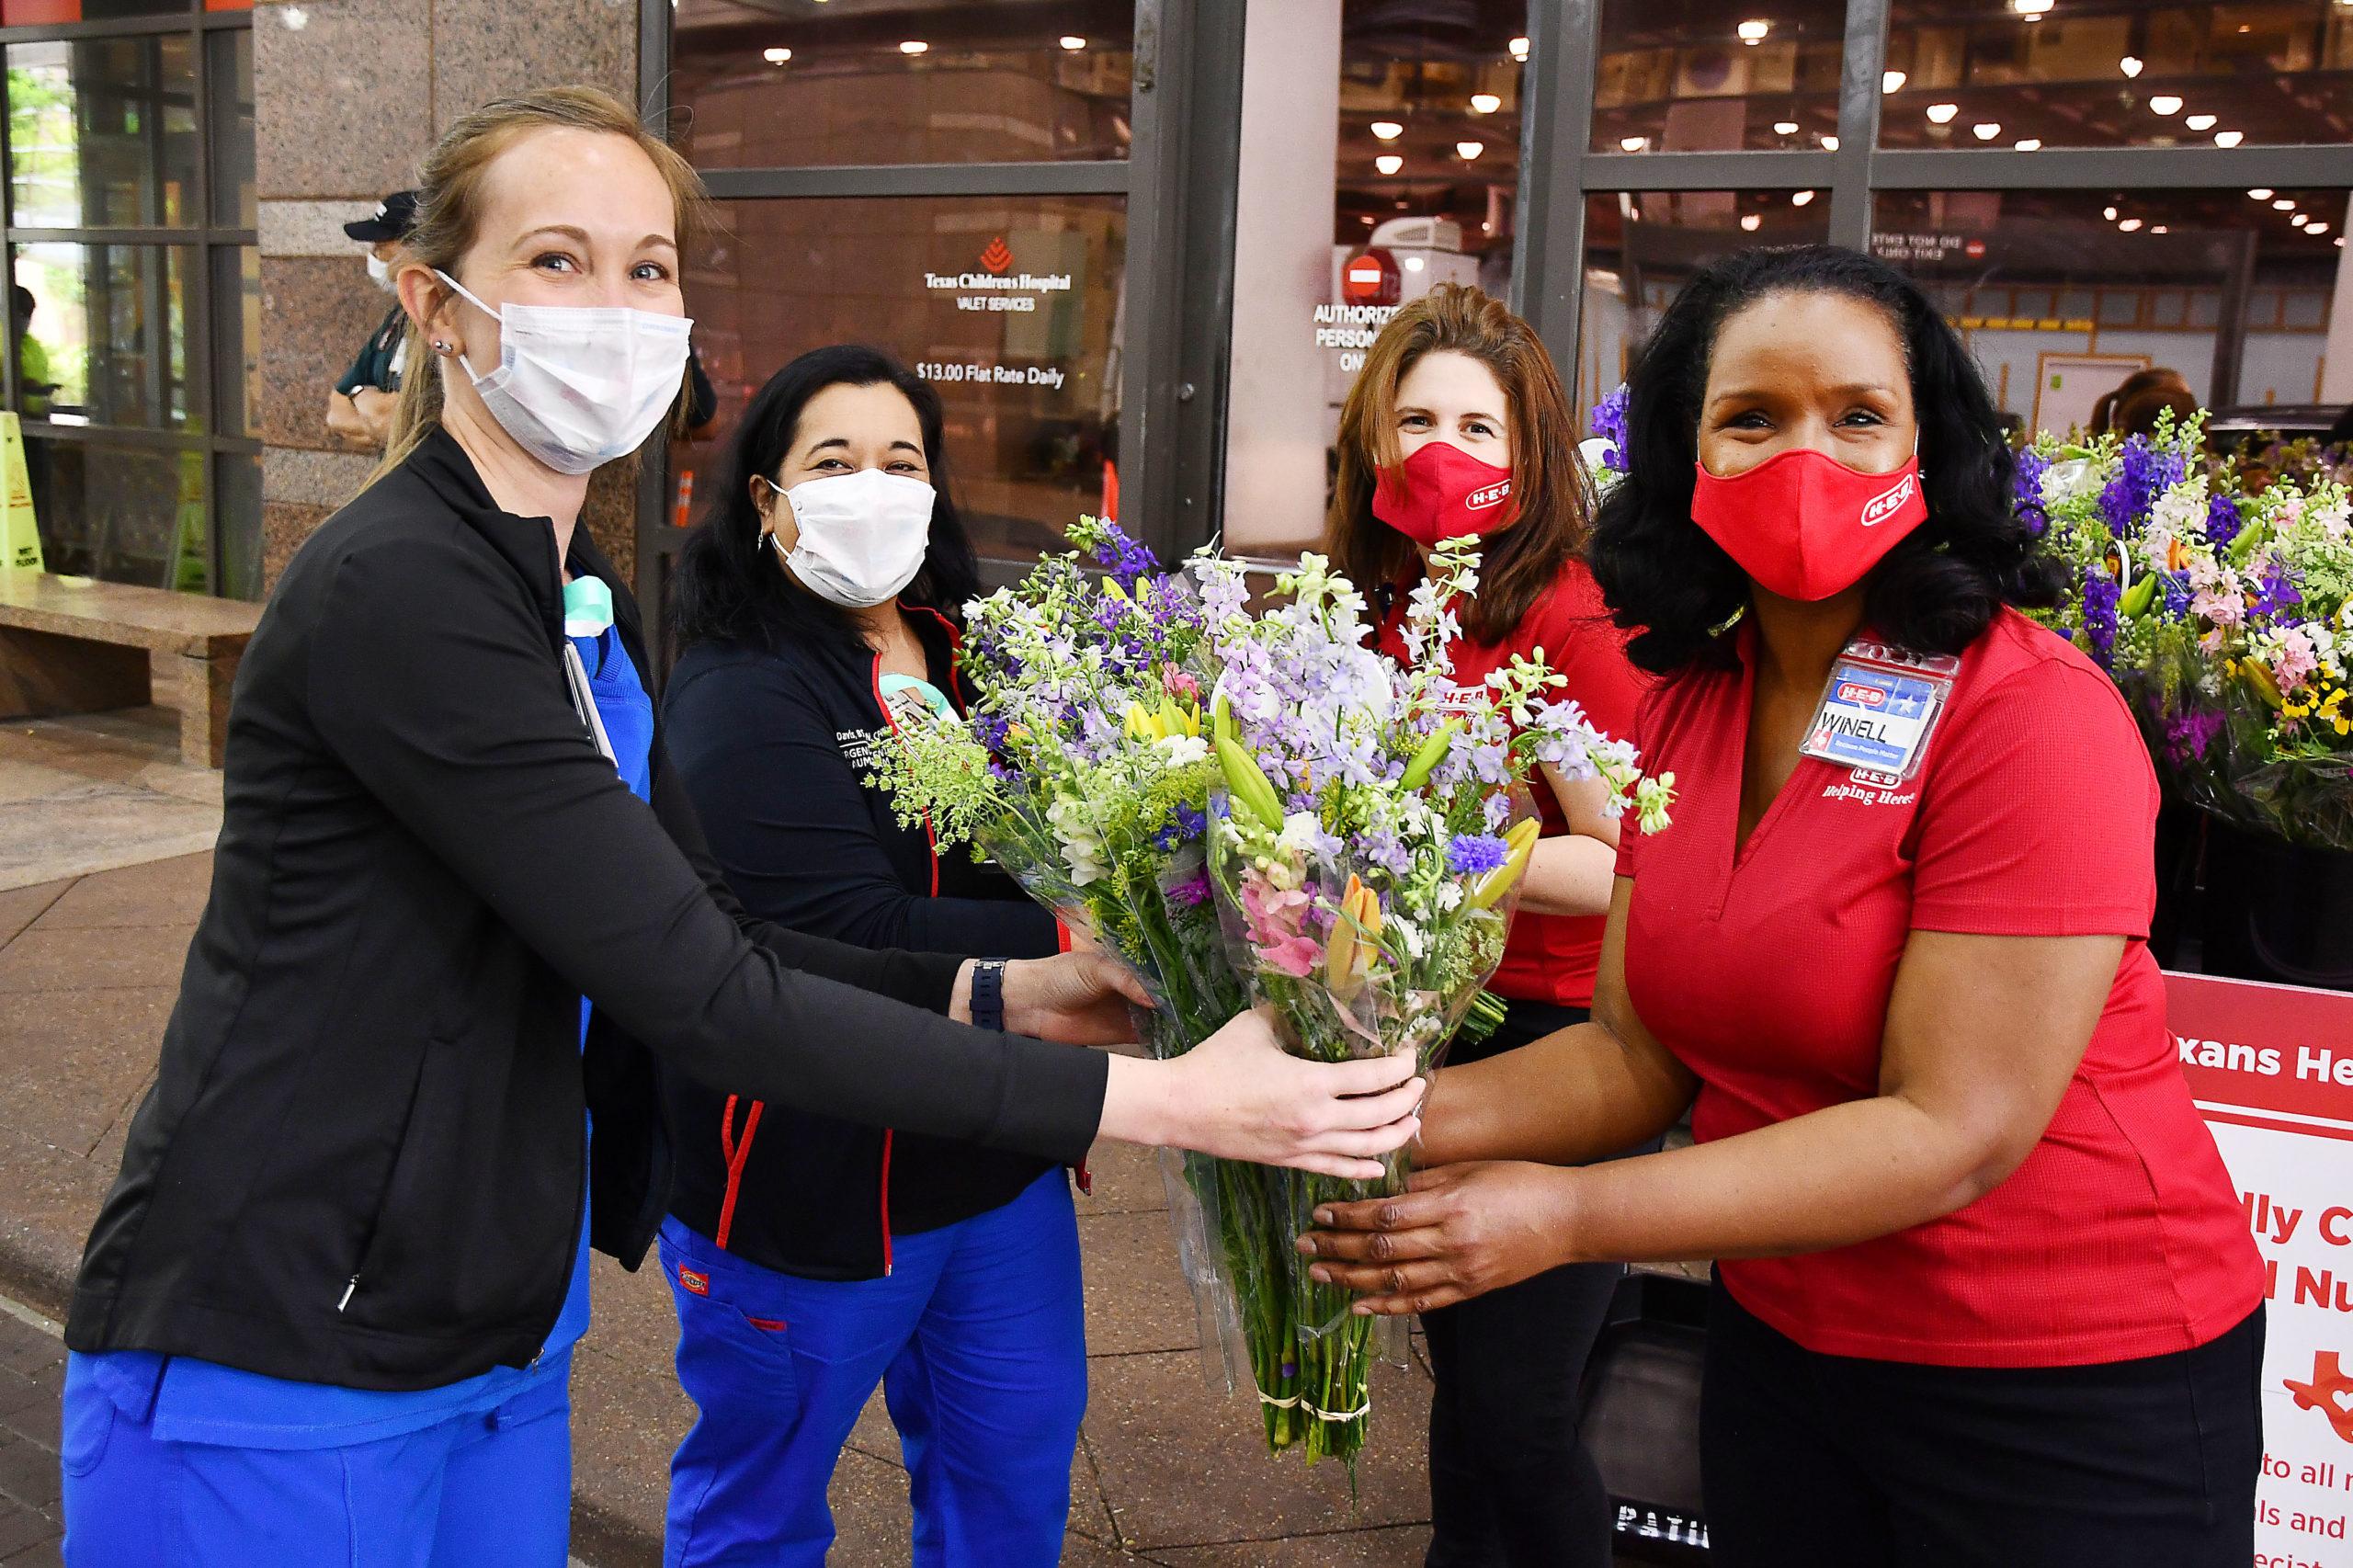 H-E-B honors nurses across Texas in celebration of National Nurses Week - H-E-B Newsroom